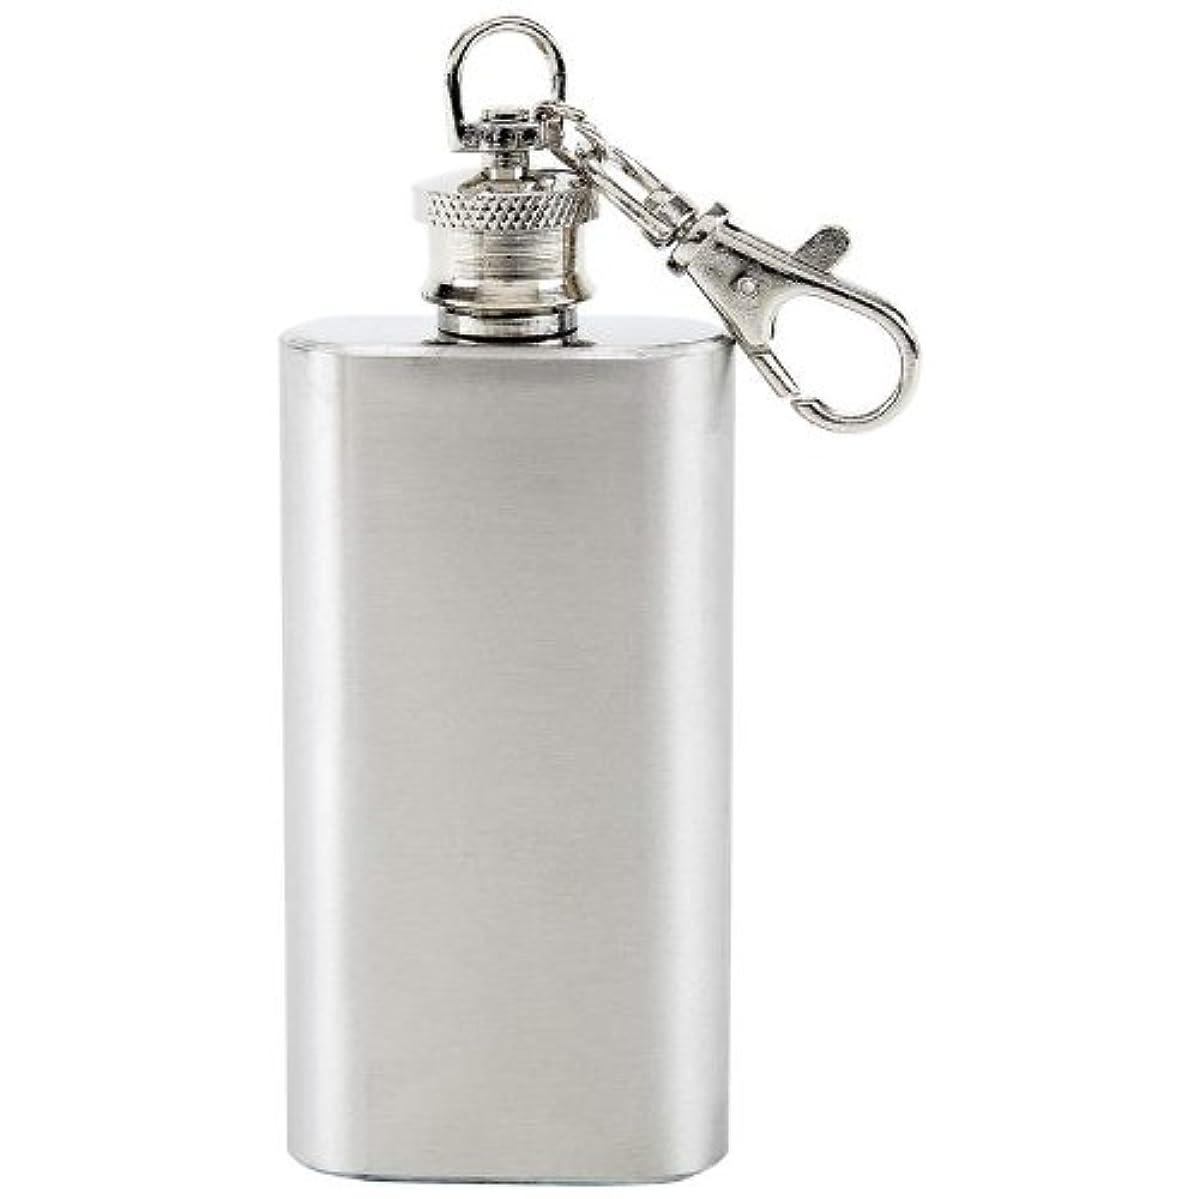 Maxam KTFLKC2 Stainless Steel Key Chain Flask, 2 oz